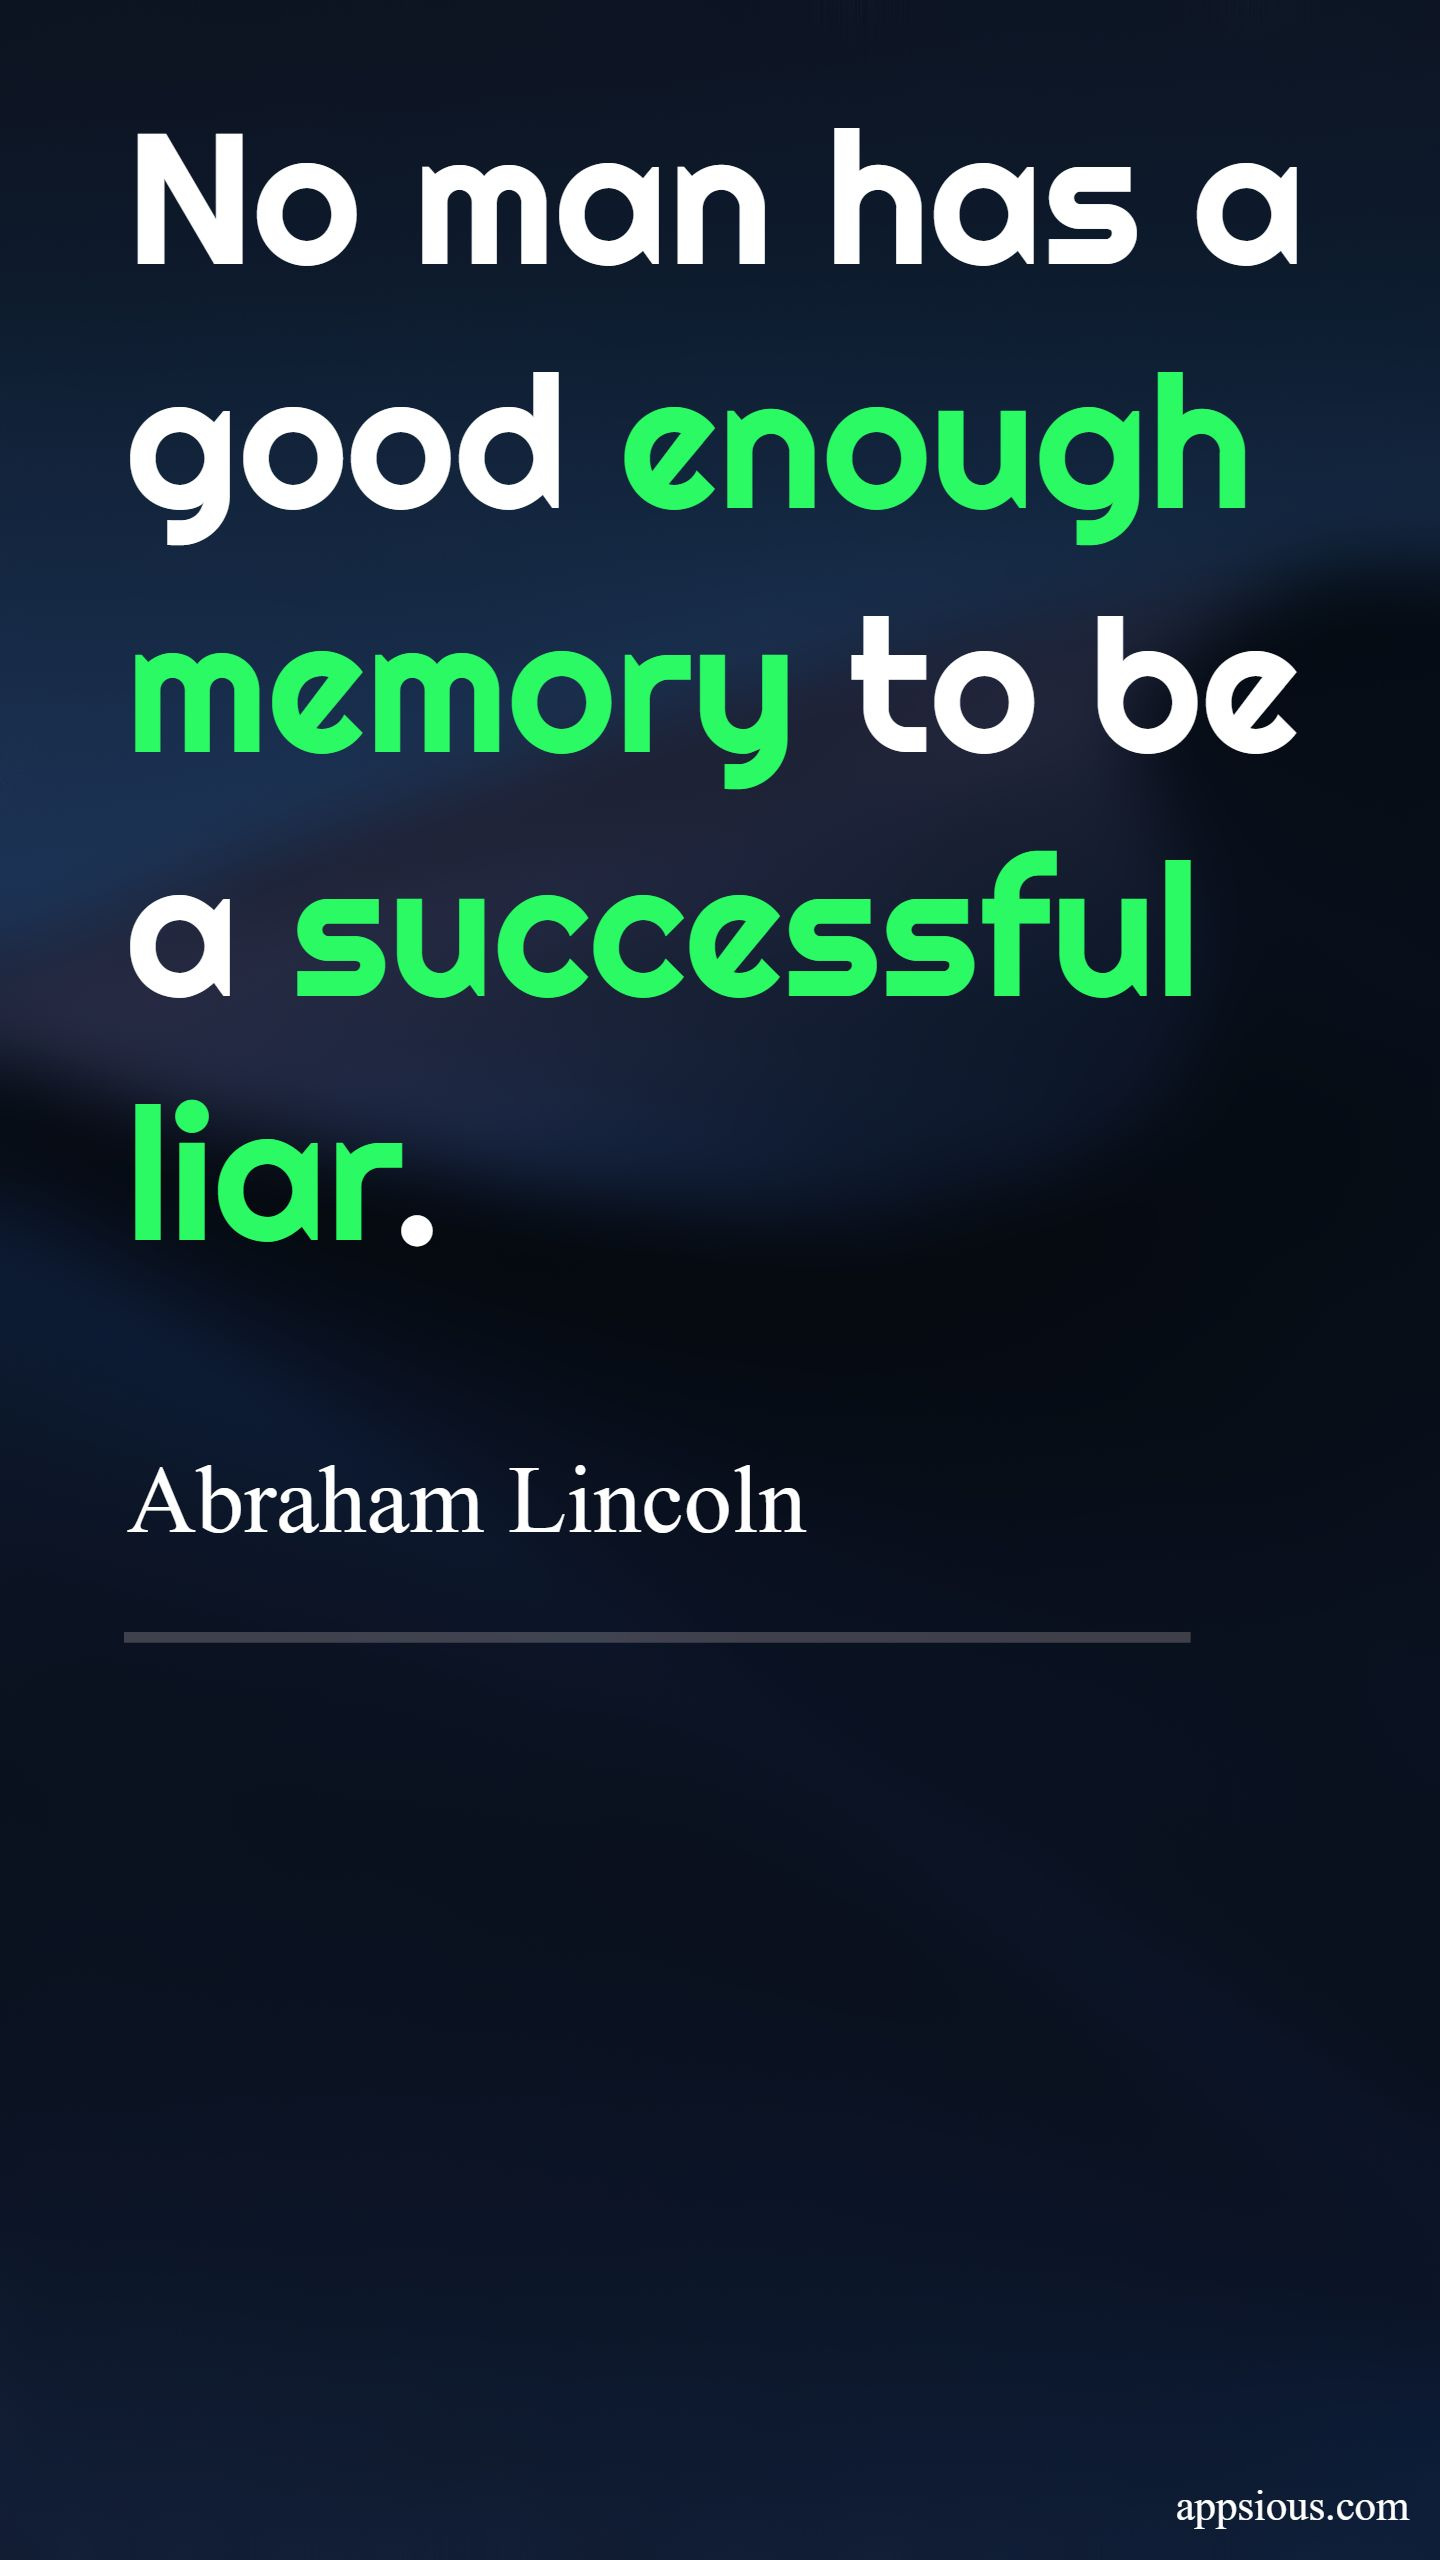 No man has a good enough memory to be a successful liar.